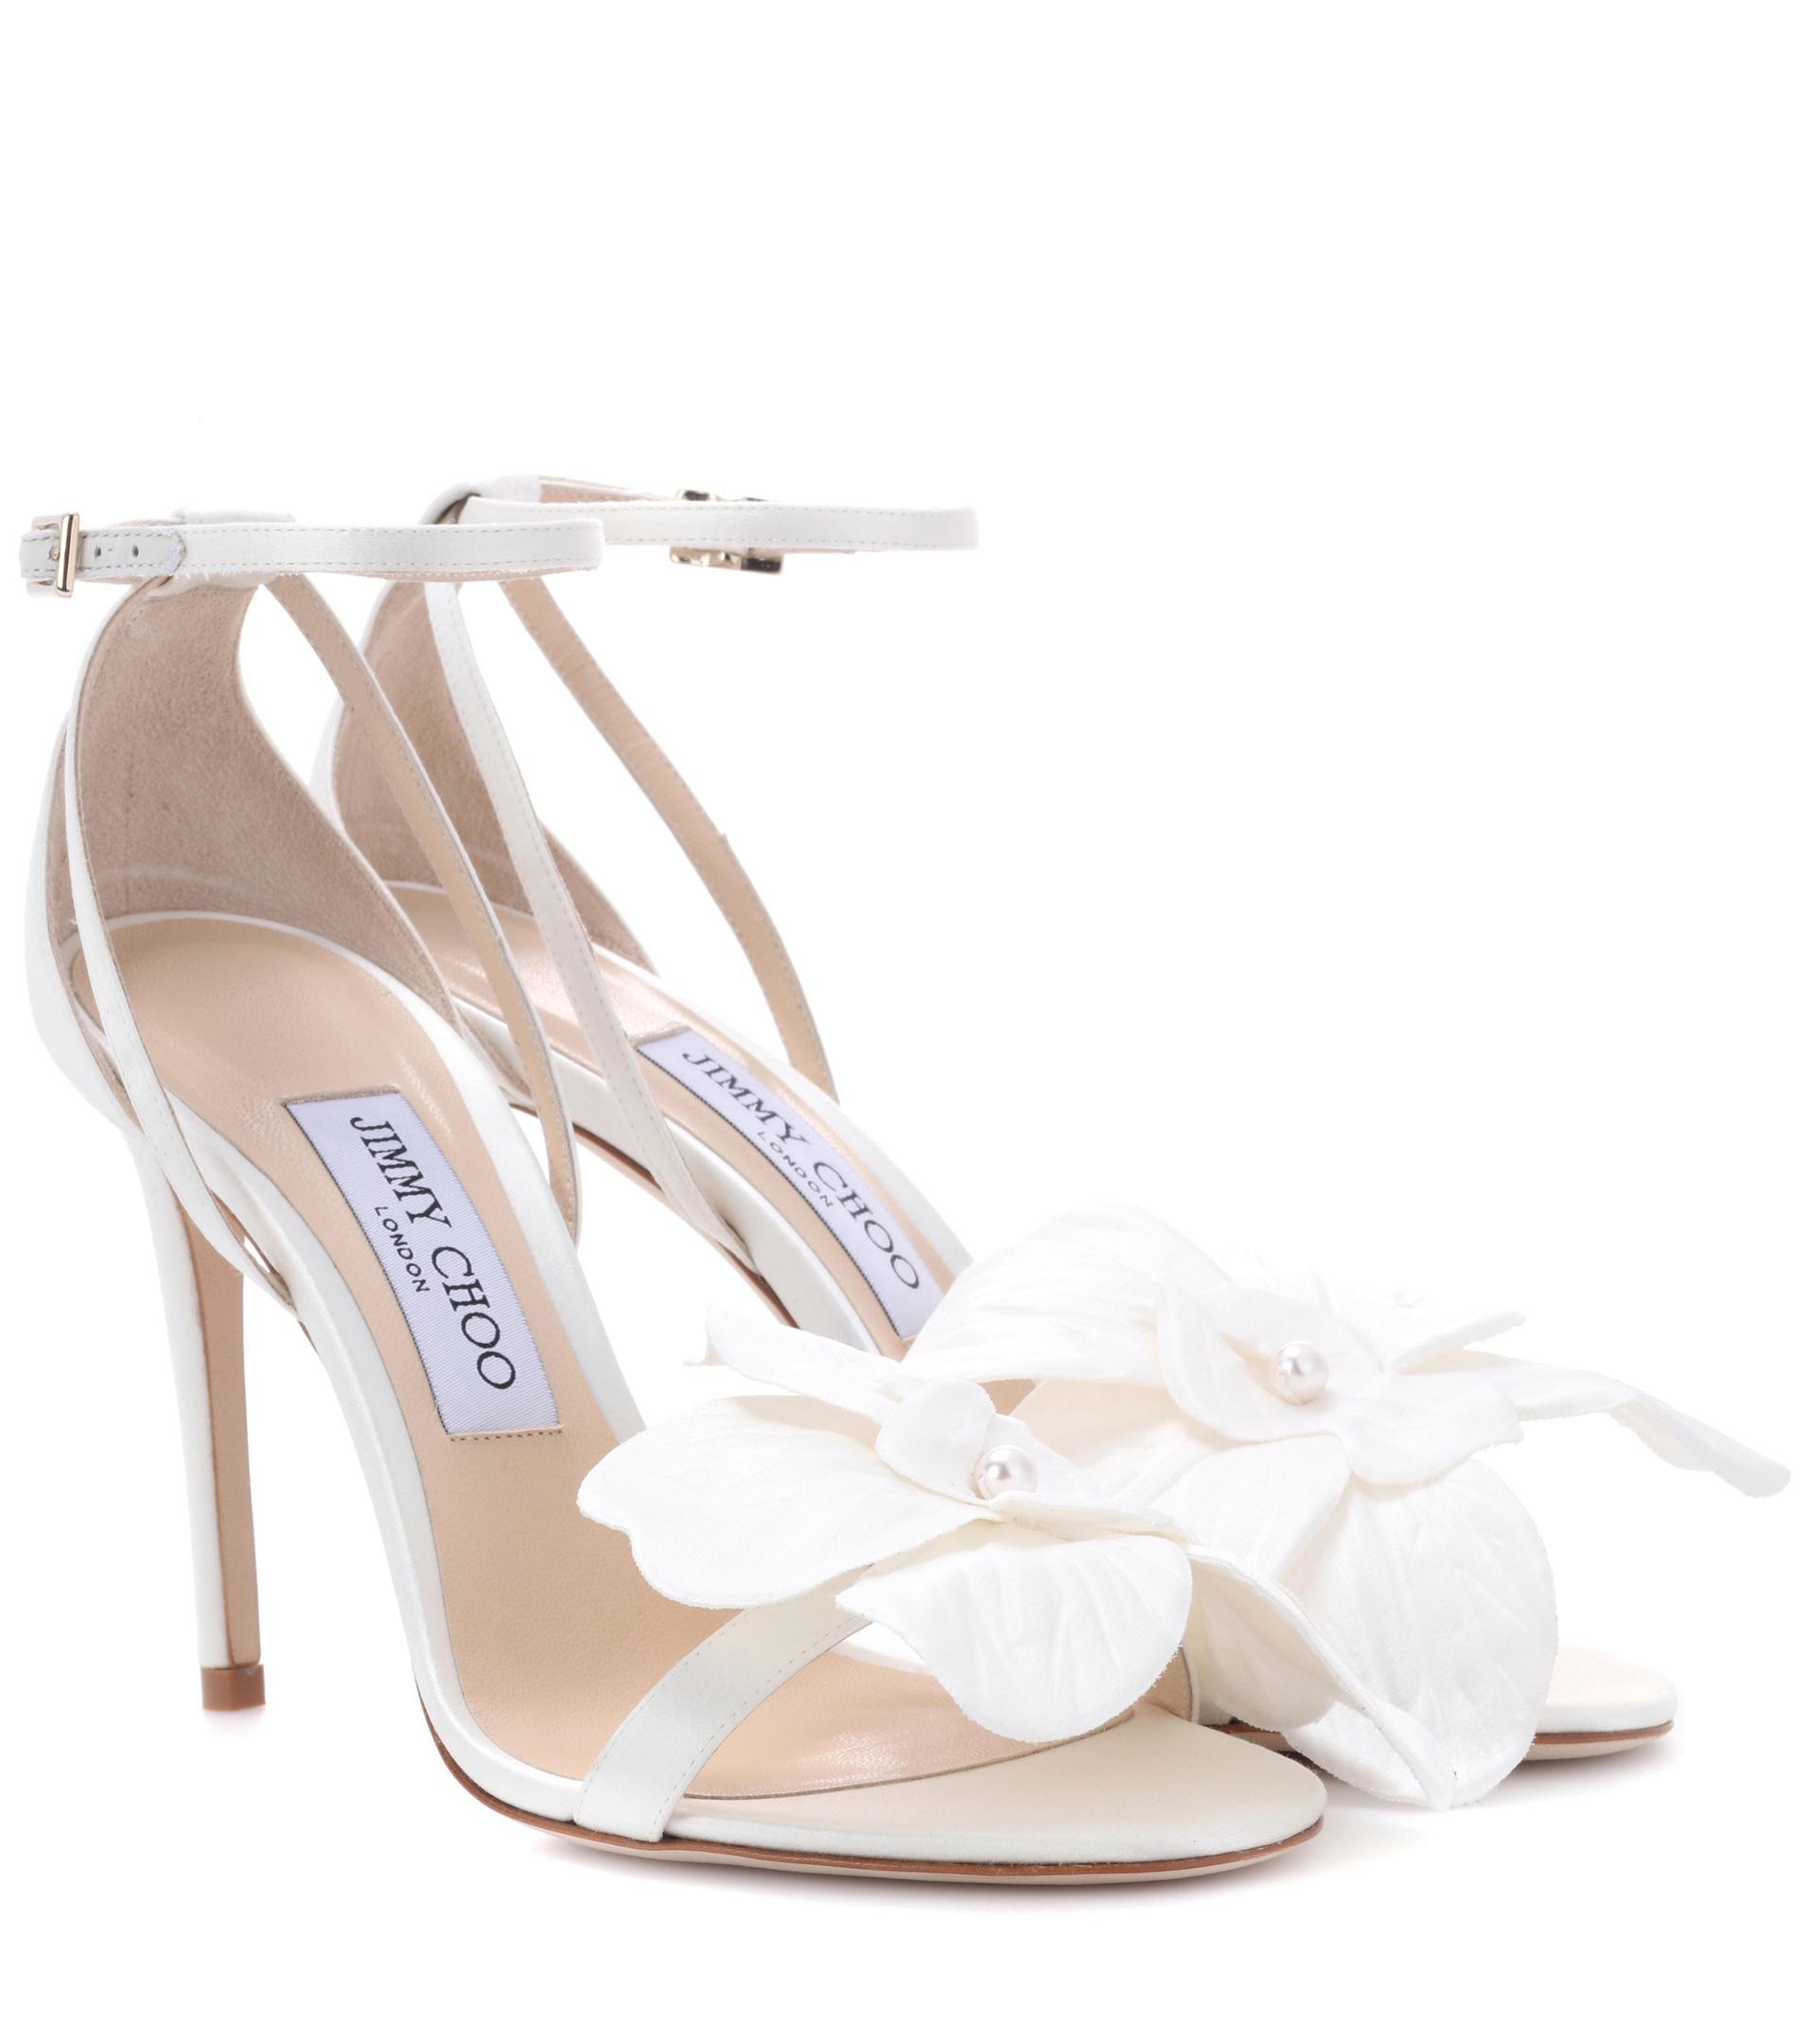 Jimmy Choo Leather Aurelia 100 Sandals